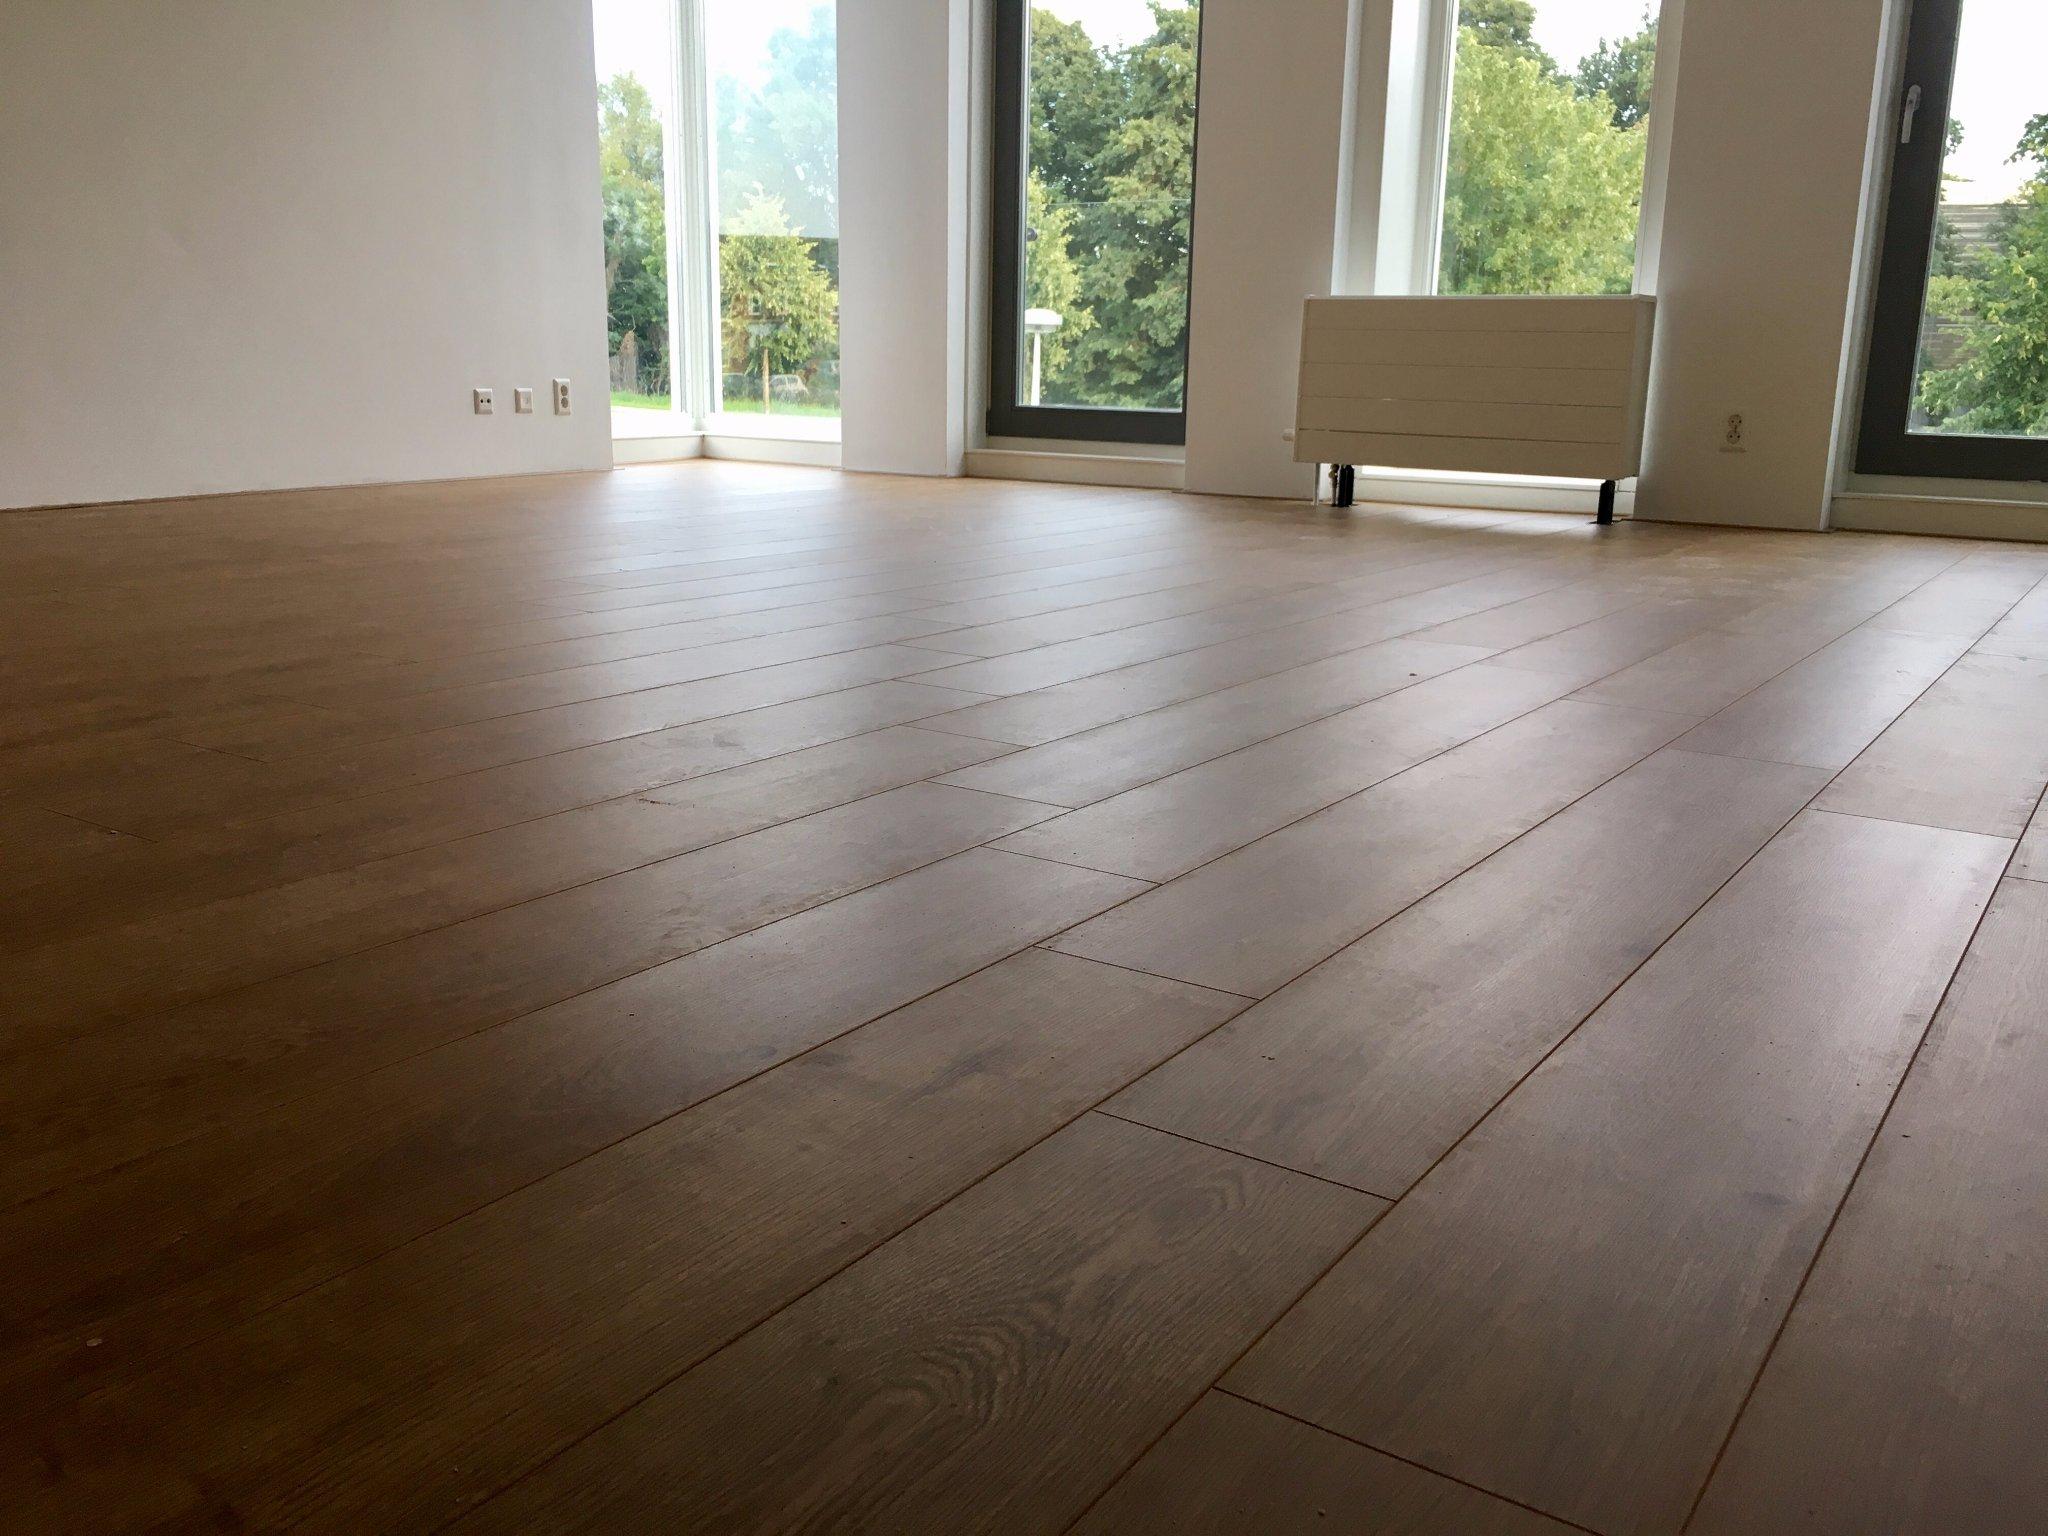 Praxis Laminaat Aanbieding : Praxis houten vloer perfect mooi houten vloer praxis ontwerpen